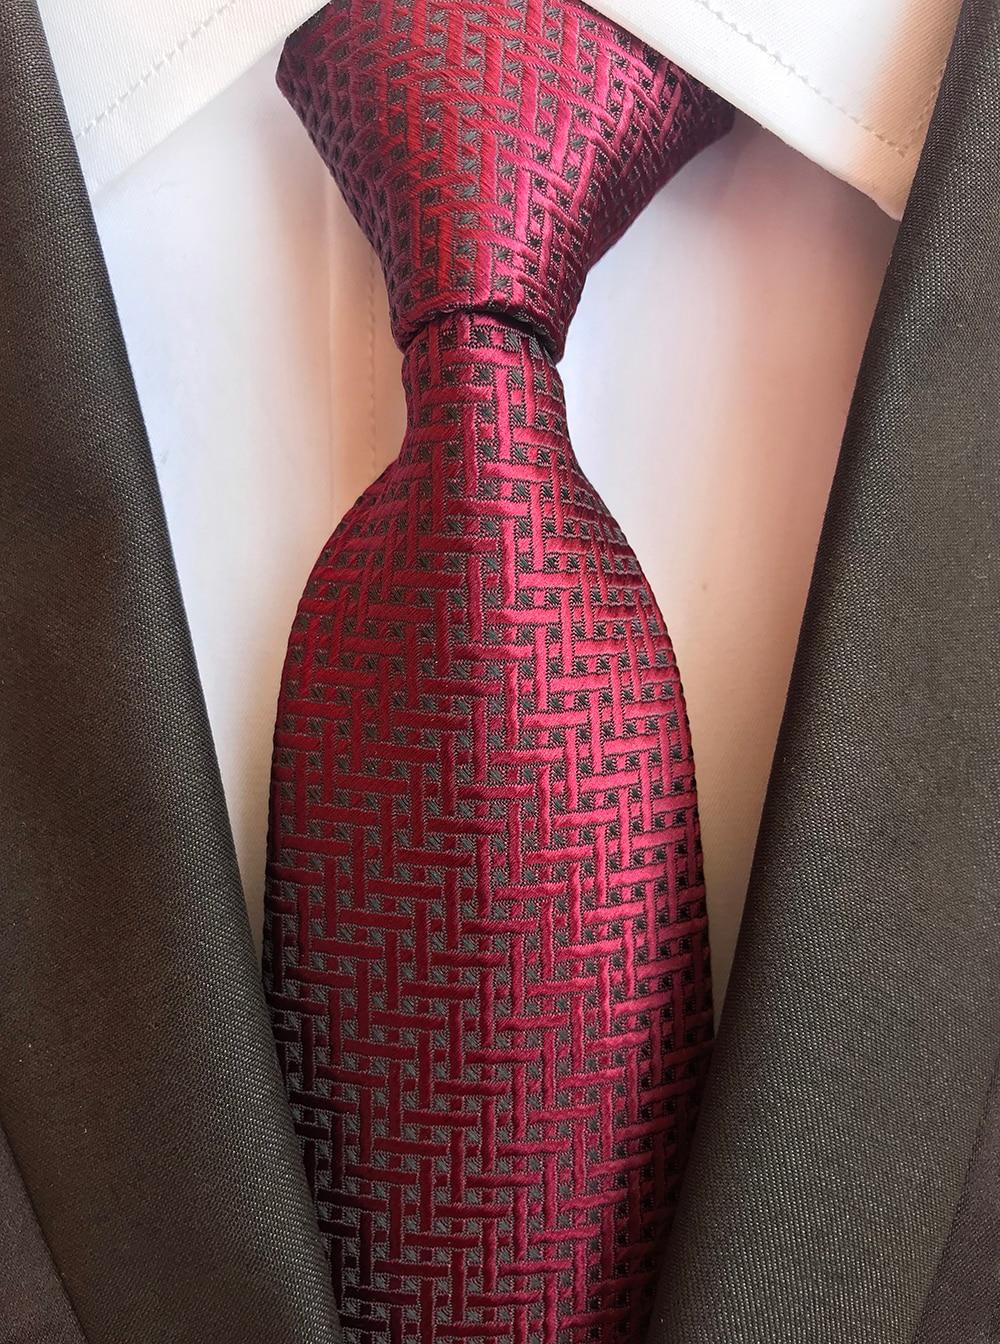 Classic 8cm Ties for Man 100% Silk Tie Luxury Striped Plaid Checks Business Neck Tie for Men Suit Cravat Wedding Party Neckties 4